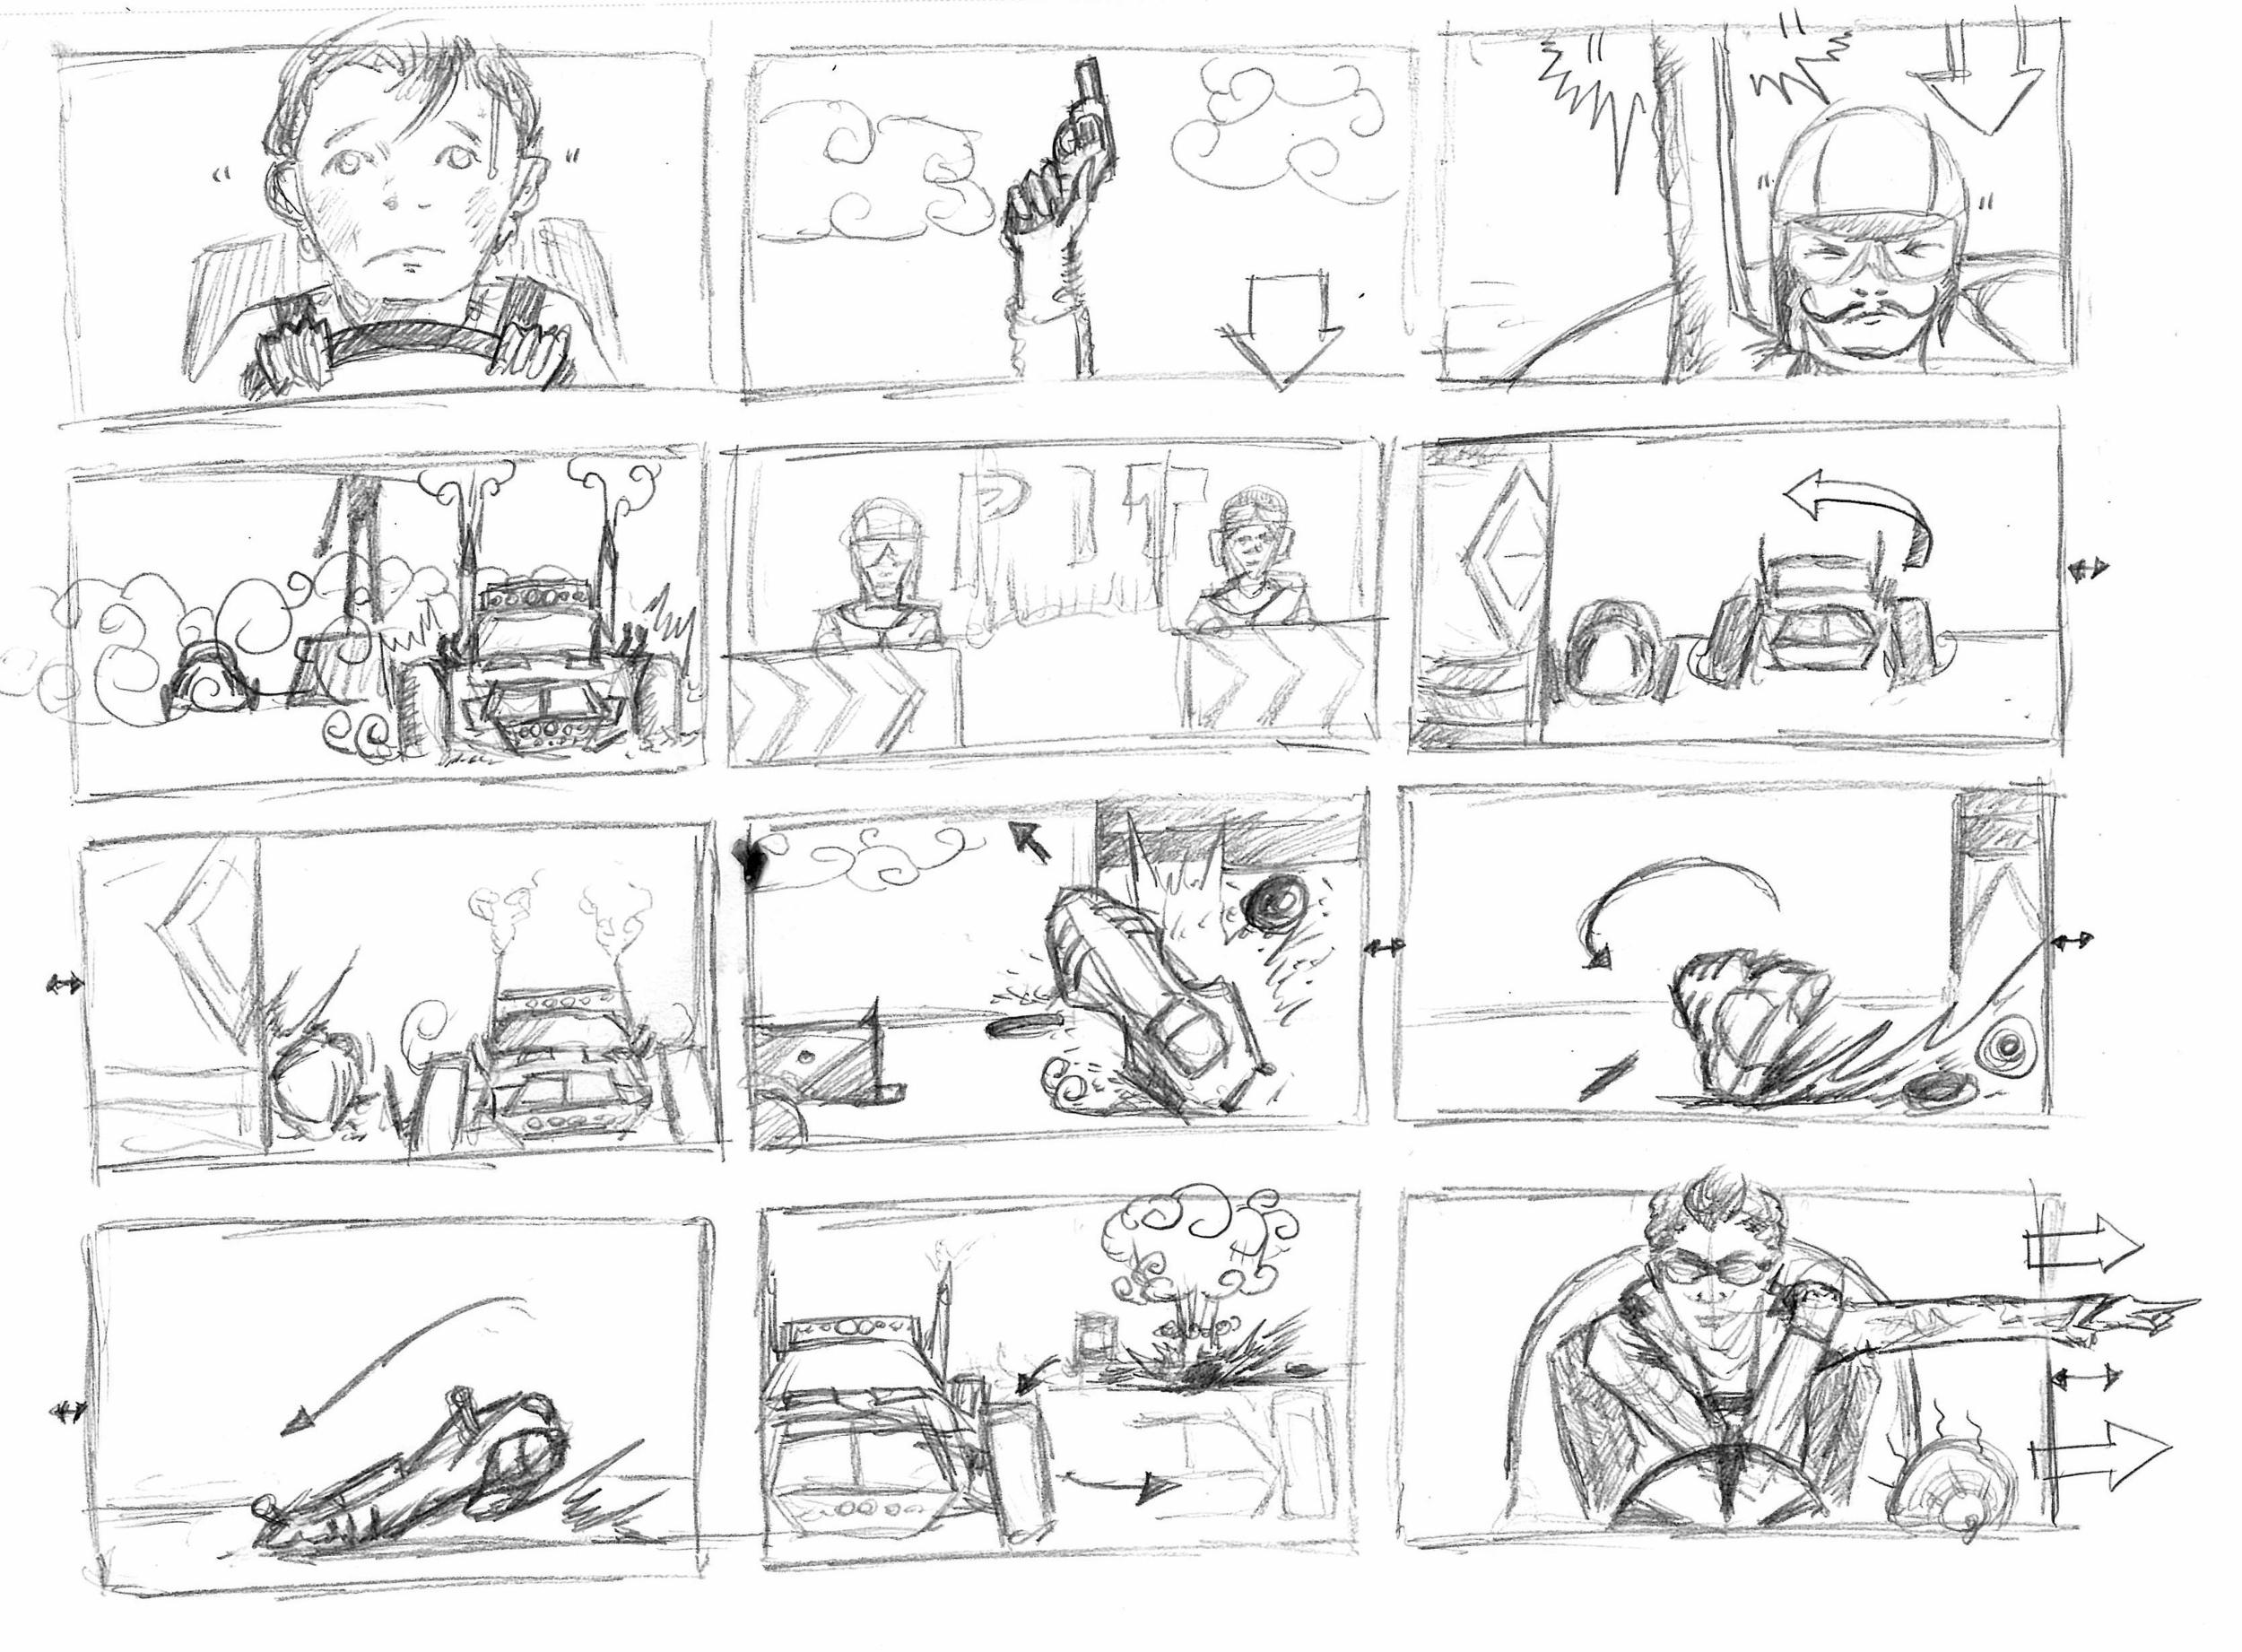 Prix Storyboard_PG007 - Film and TV - Jonathan B Perez - cREAtive Castle Studios.jpg